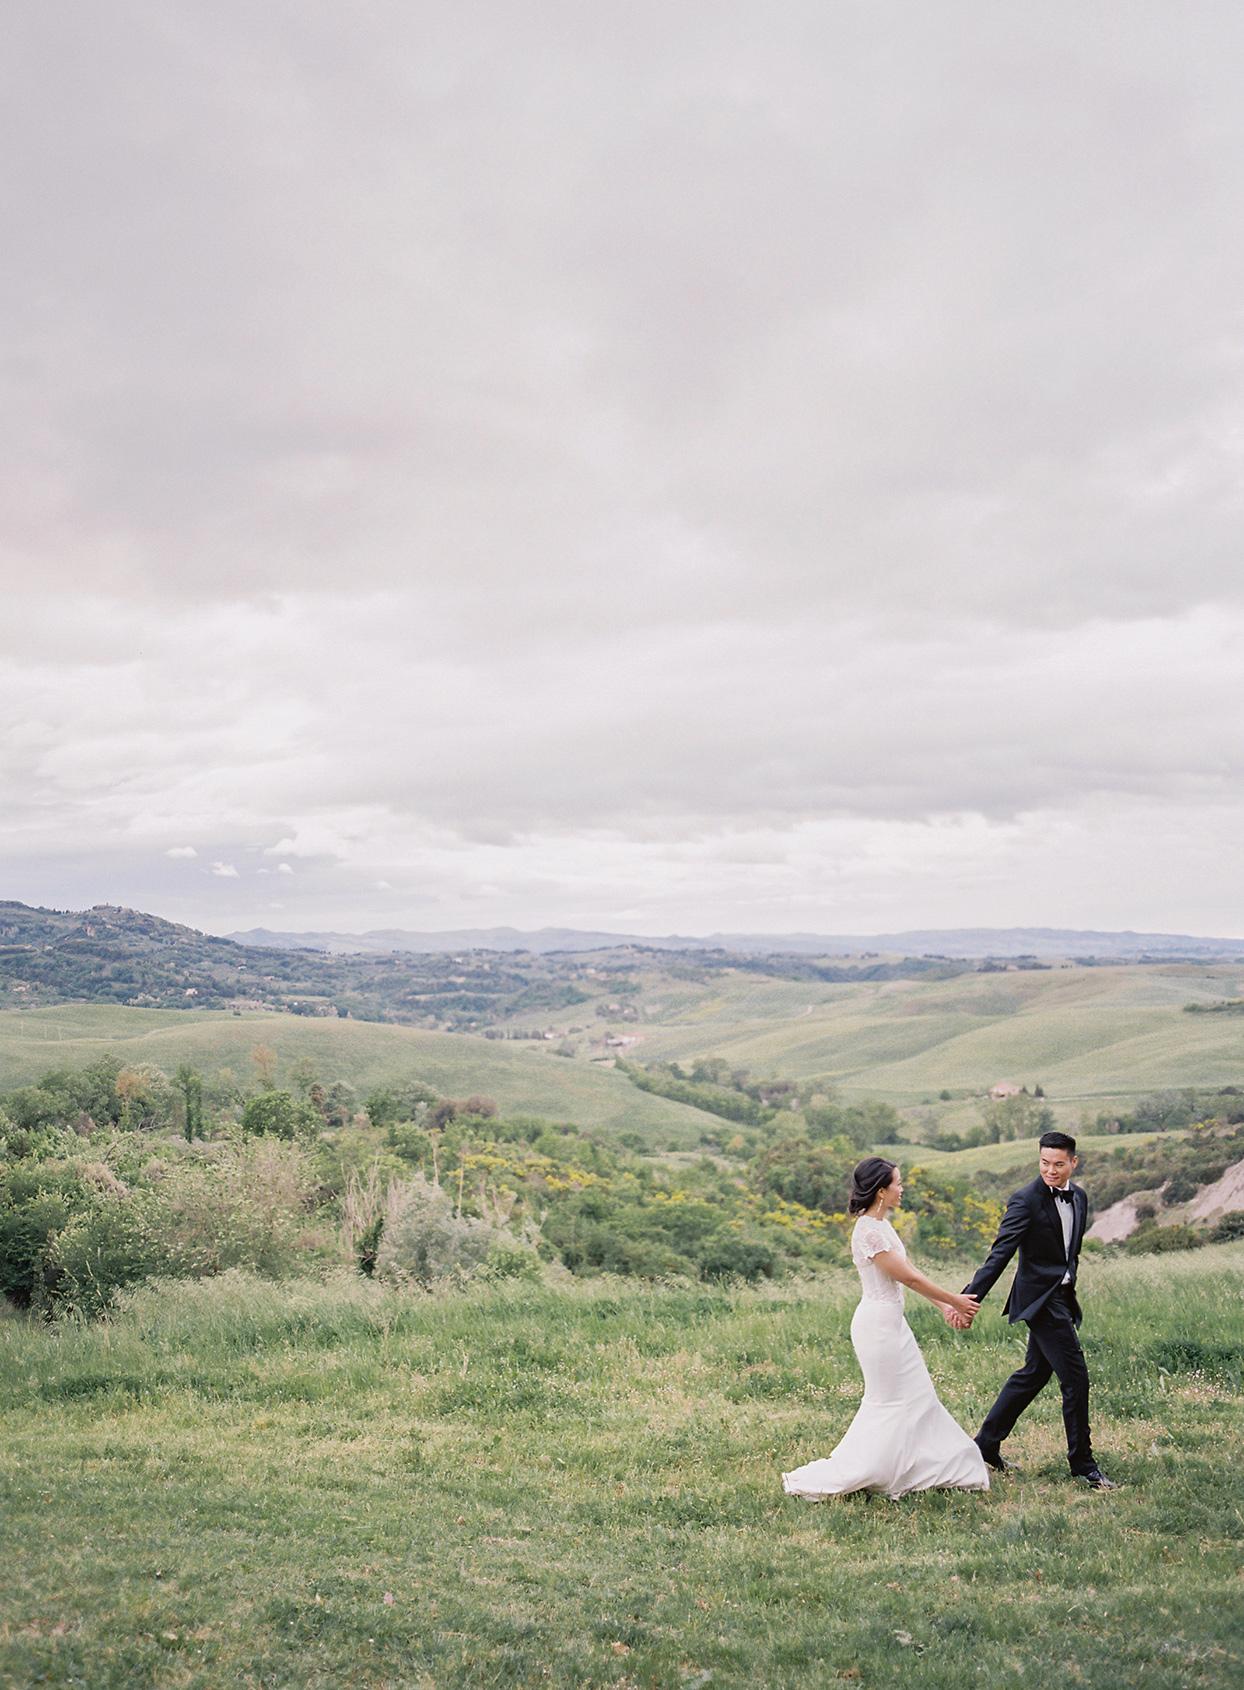 jen alan wedding couple walking through field